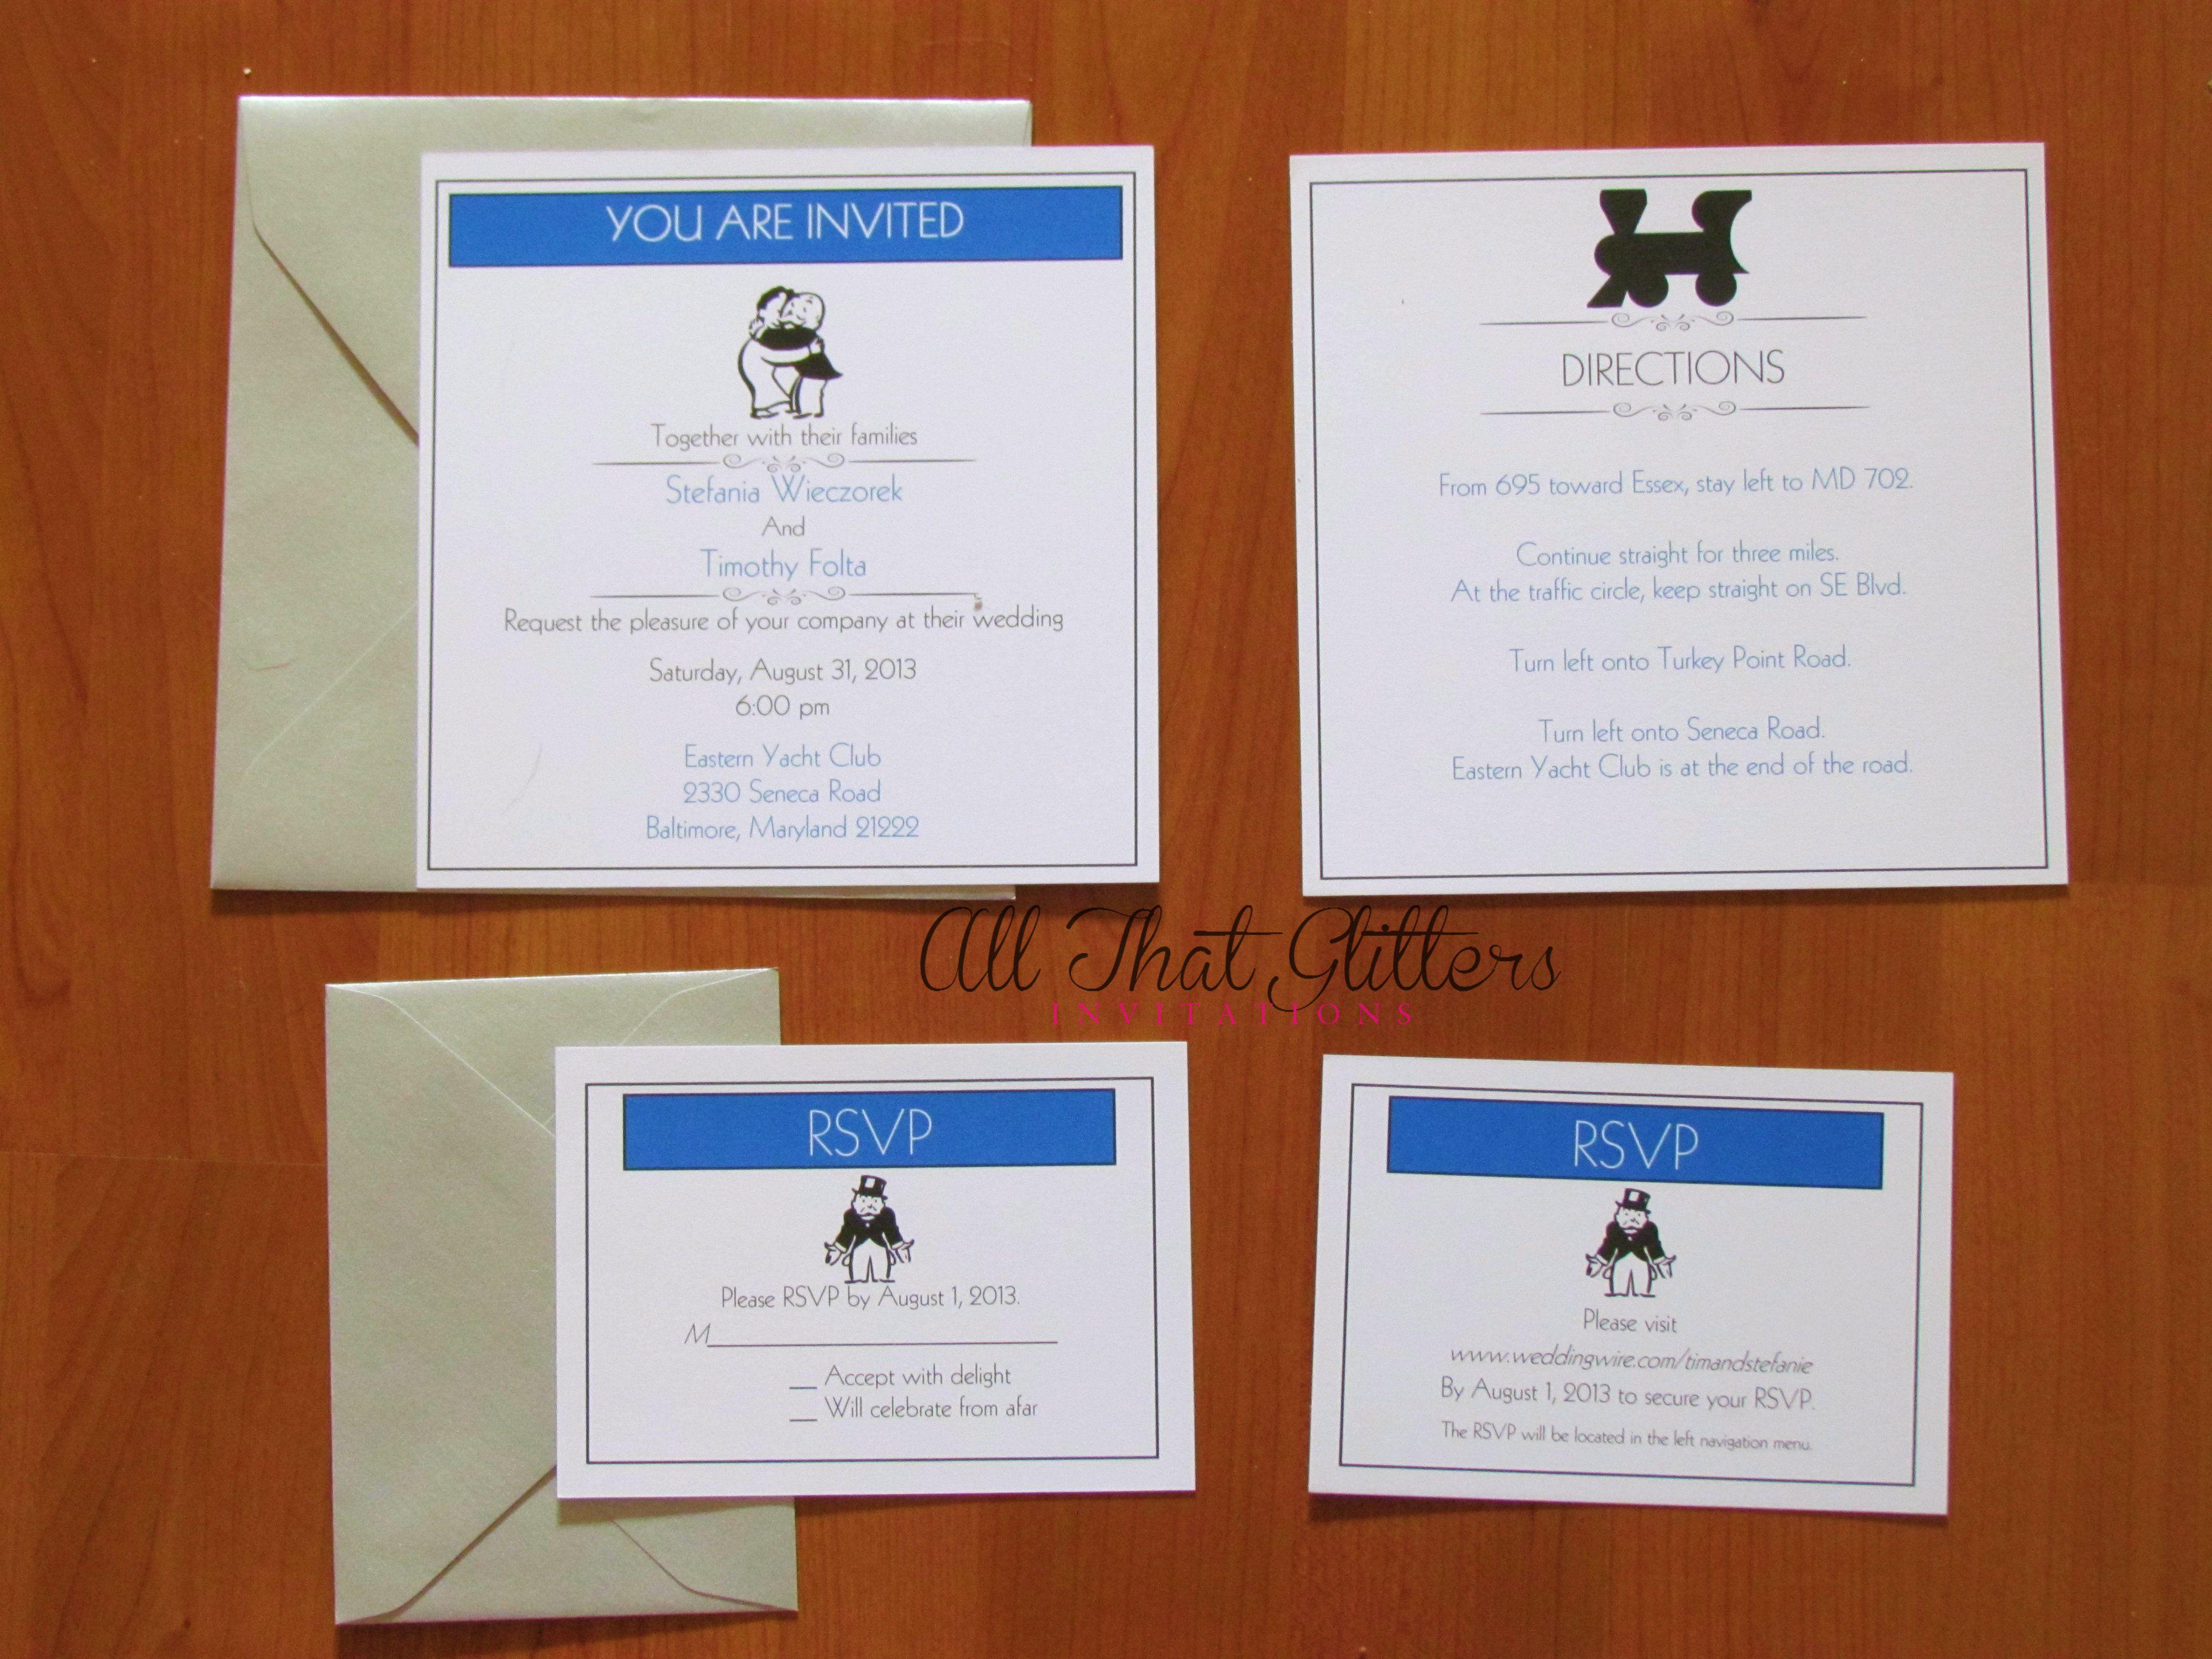 Offering Glitter Wedding Invitations & More | Wedding invitation ...